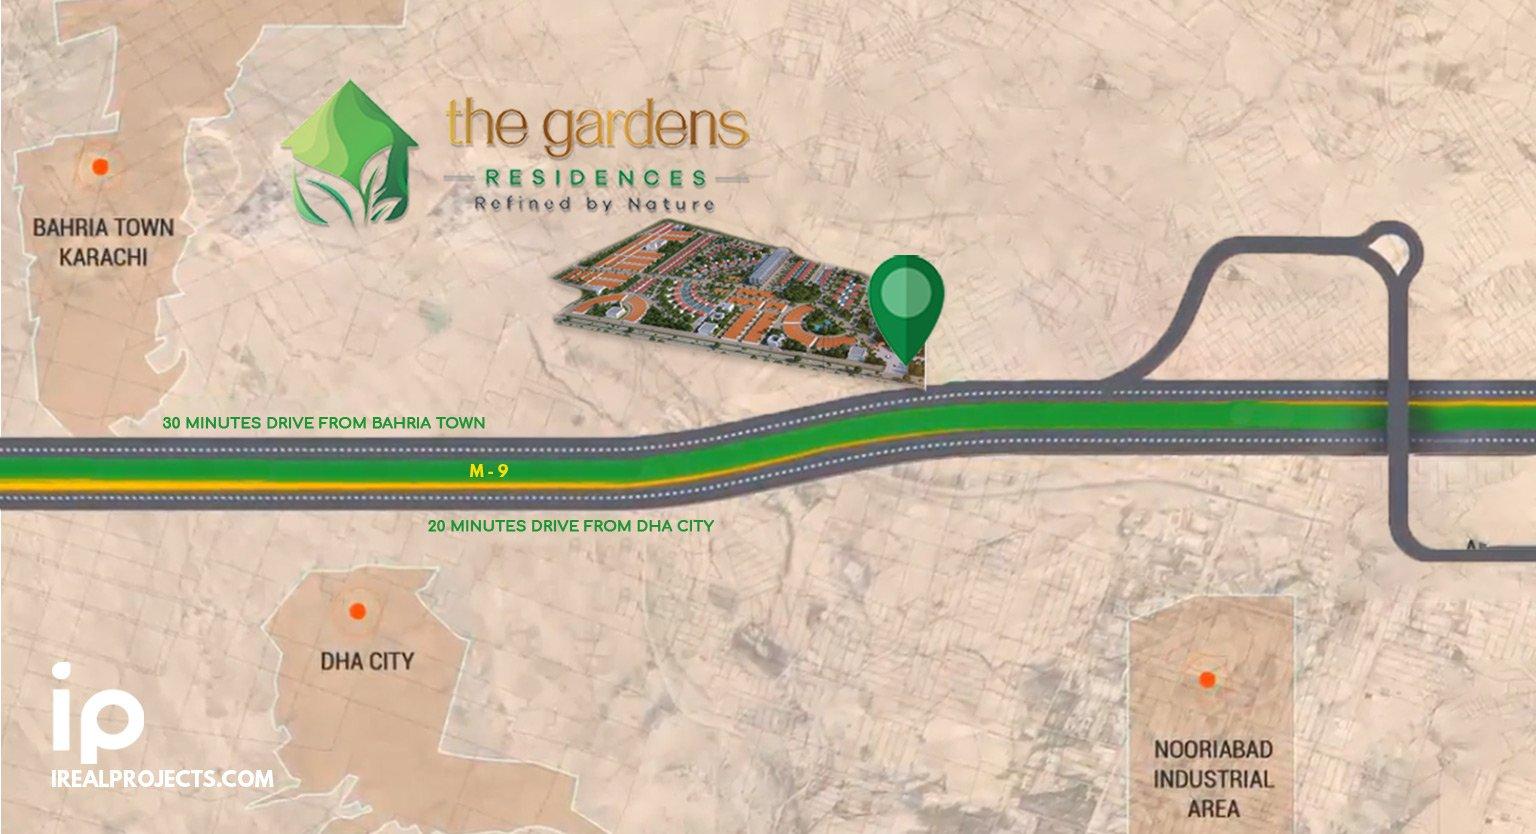 Location map of The Gardens Residences Karachi - m9 motorway - farmhouse plots